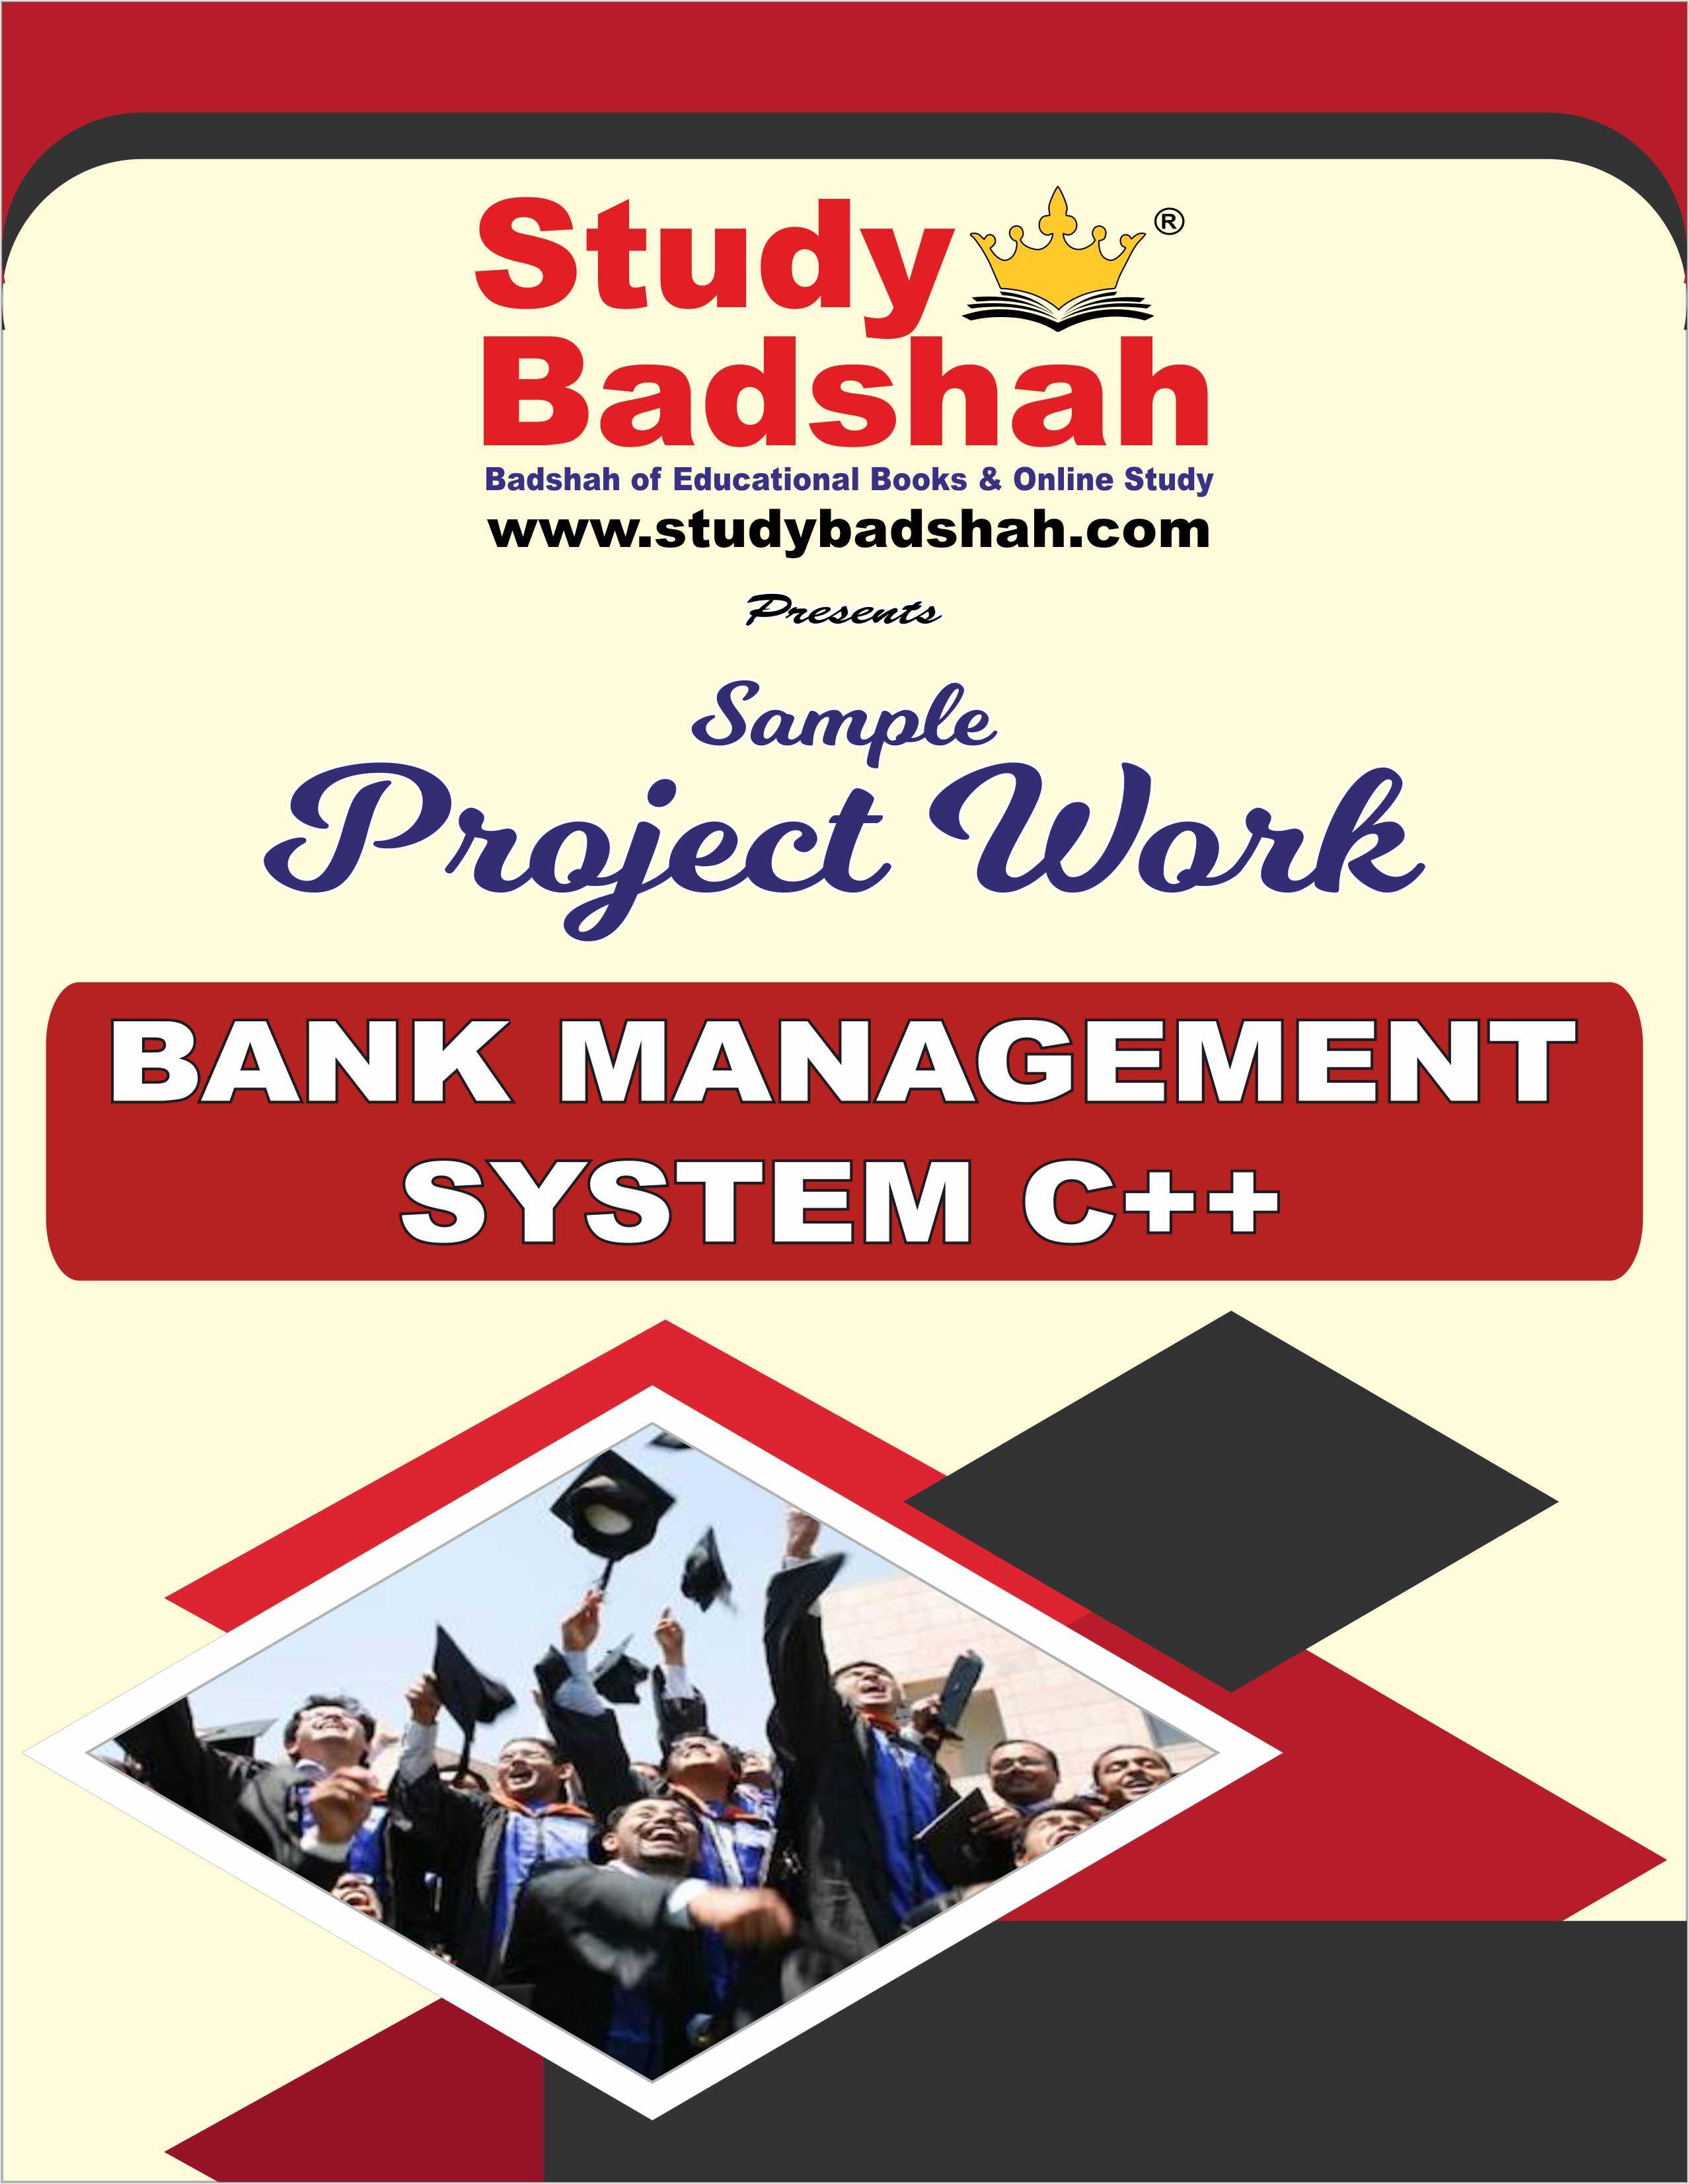 BANK MANAGEMENT SYSTEM C++